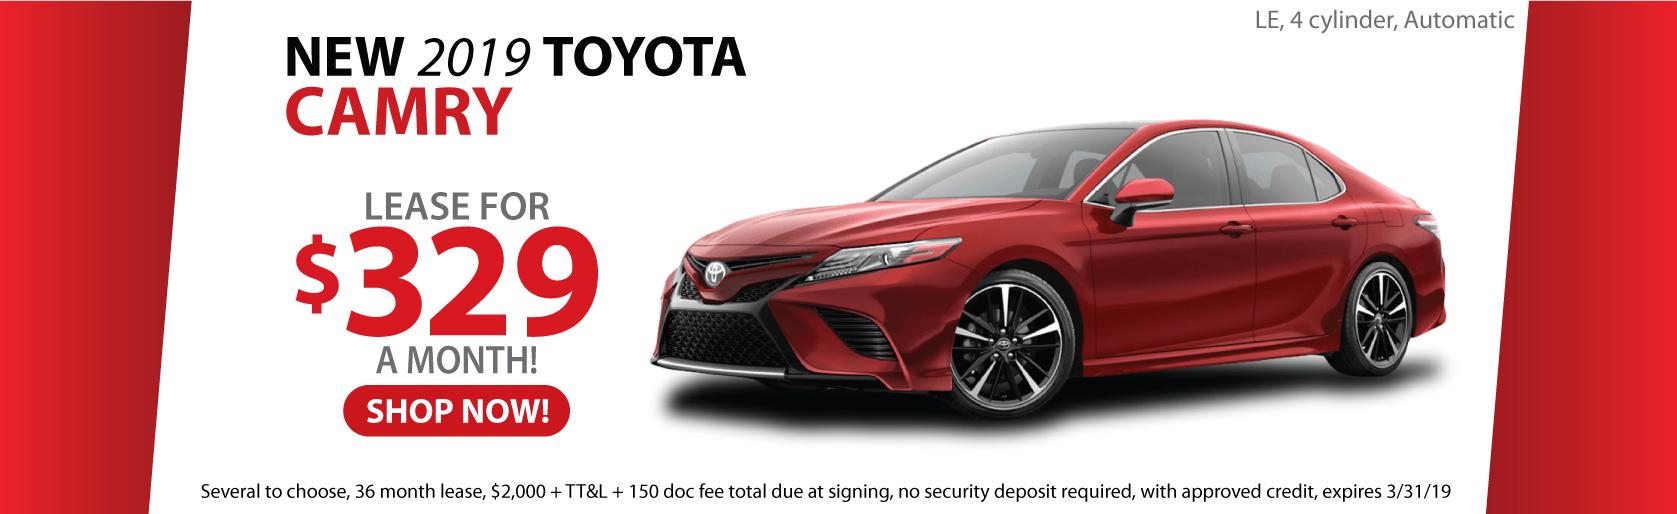 Lithia Toyota Of Abilene New Used Toyota Sales In Abilene Tx